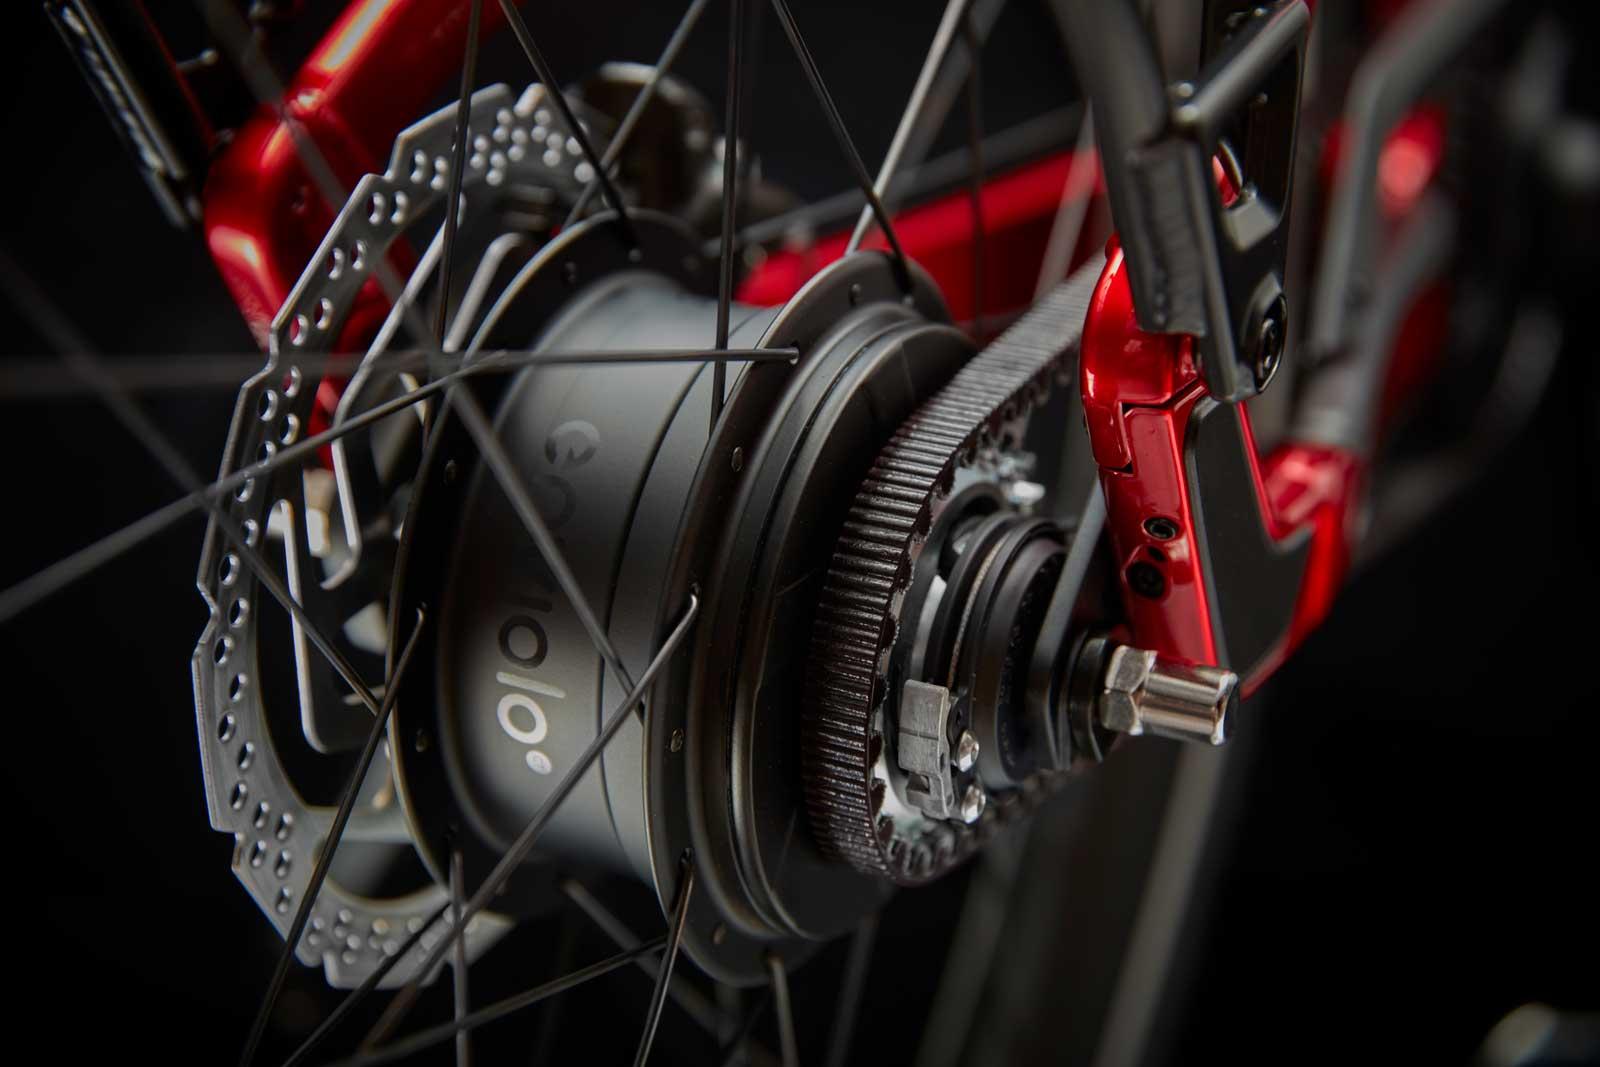 specialized turbo ebikes enviolo automatiq internal gear hub